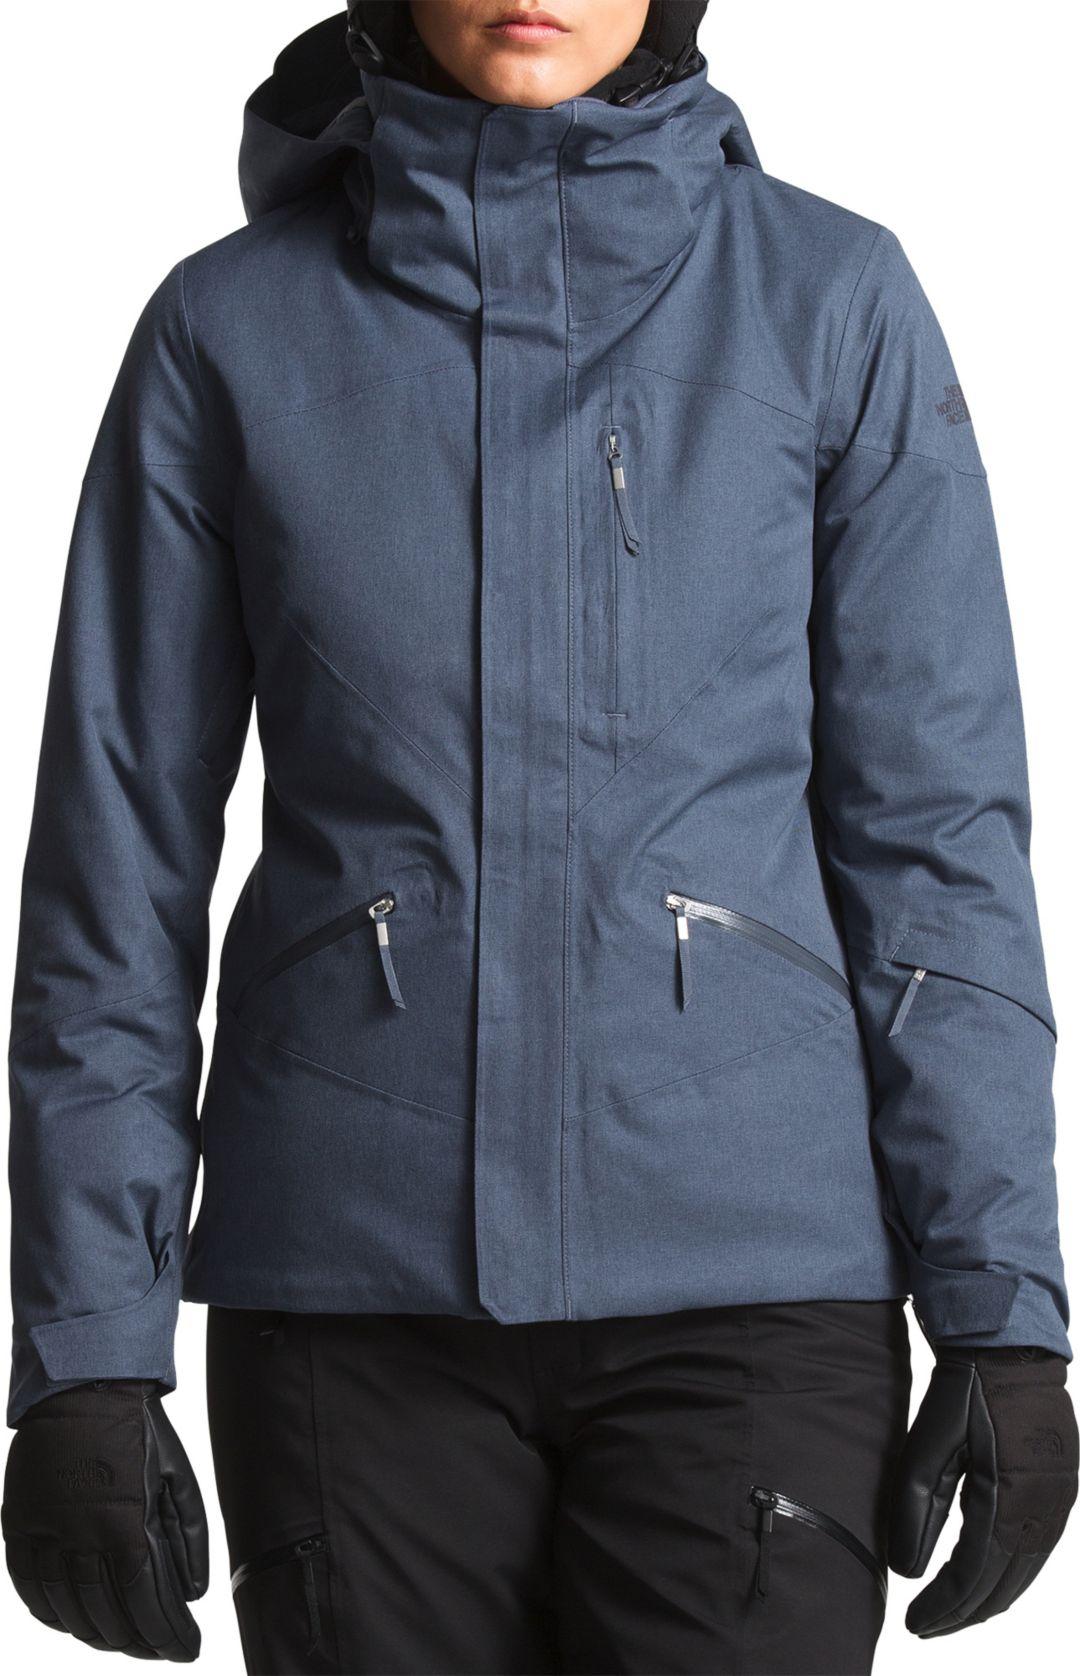 8aca0bac3 The North Face Women's Lenado Jacket